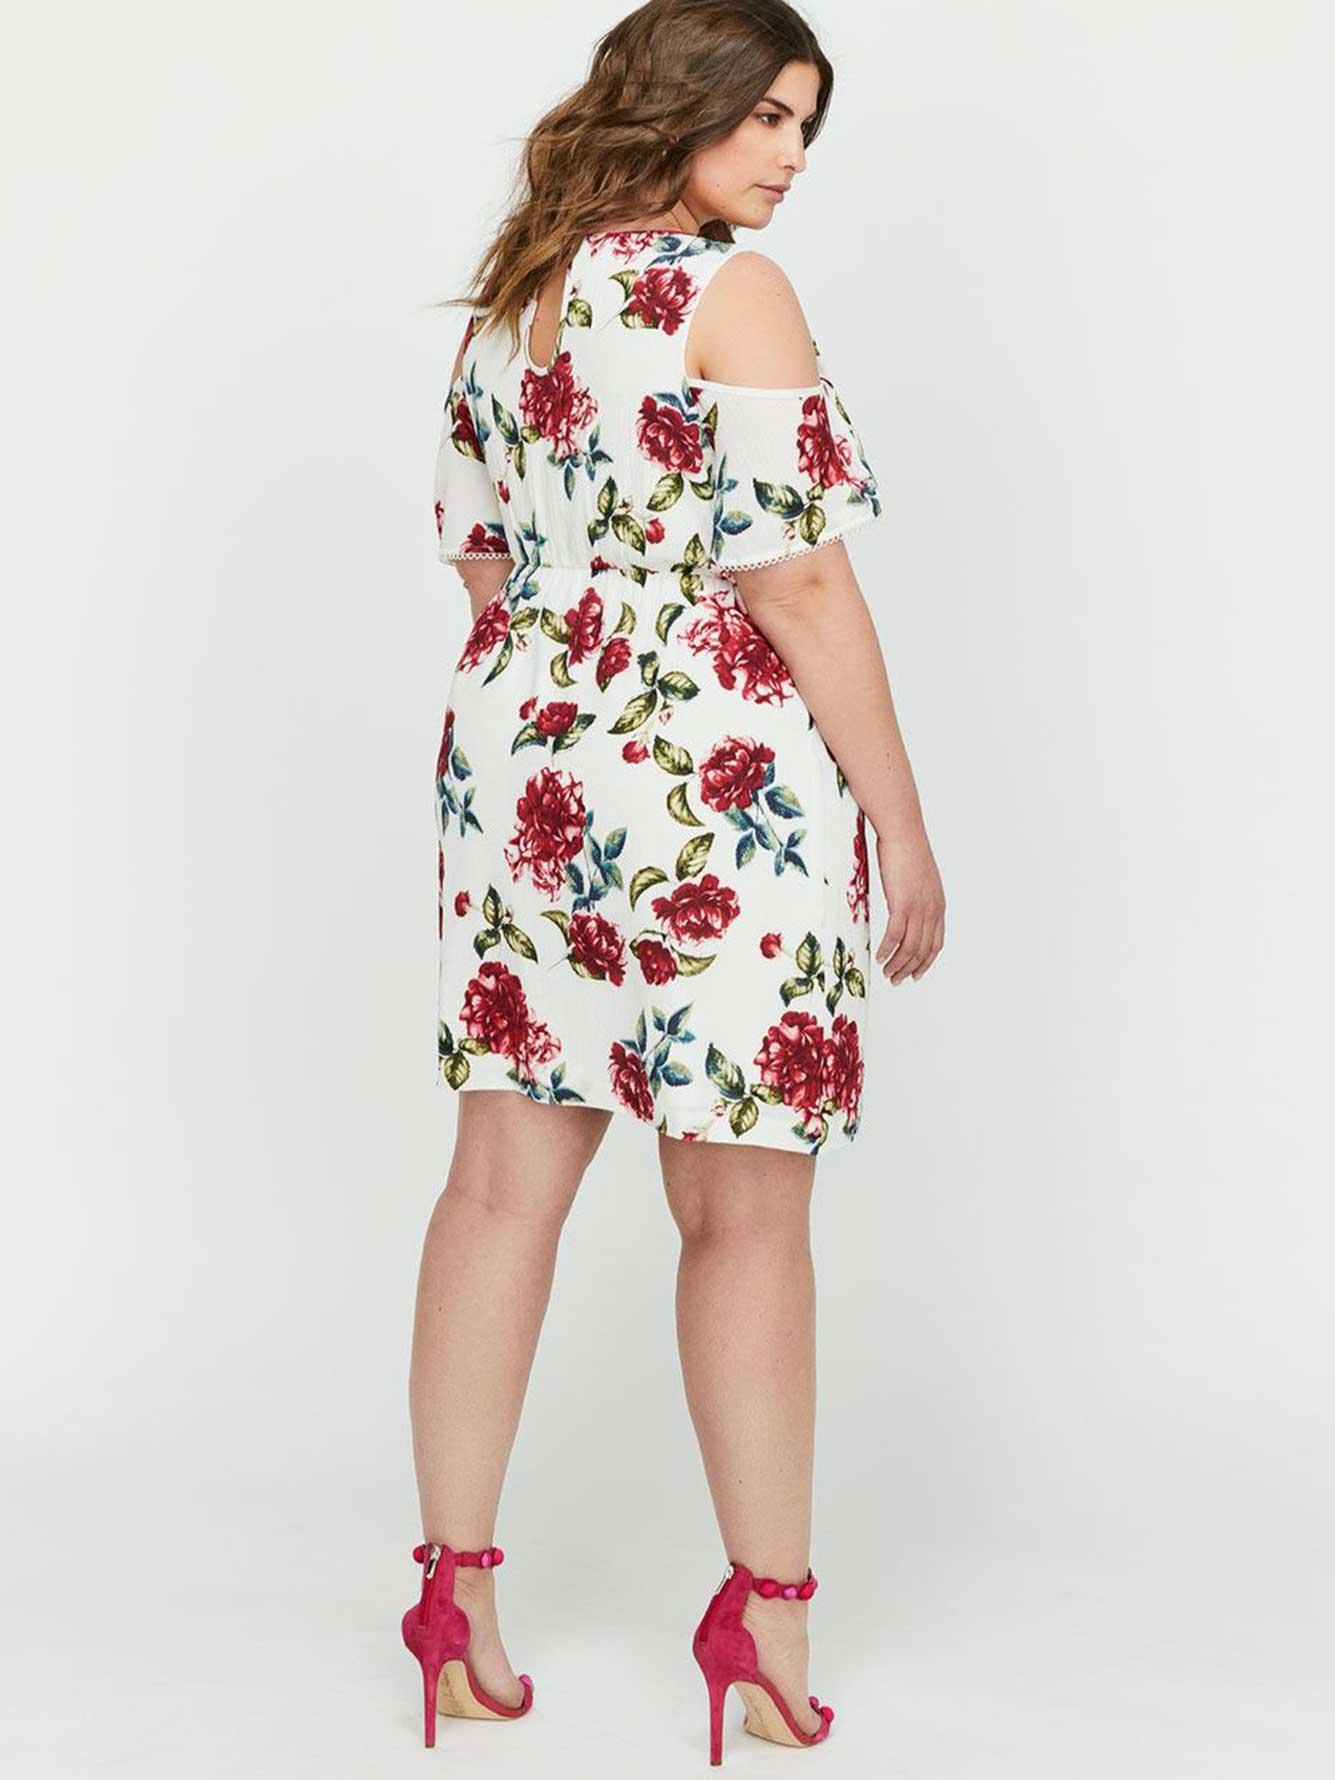 8db7f6b9e5c9 Michel Studio Cold Shoulder Fit & Flare Printed Dress | Addition Elle